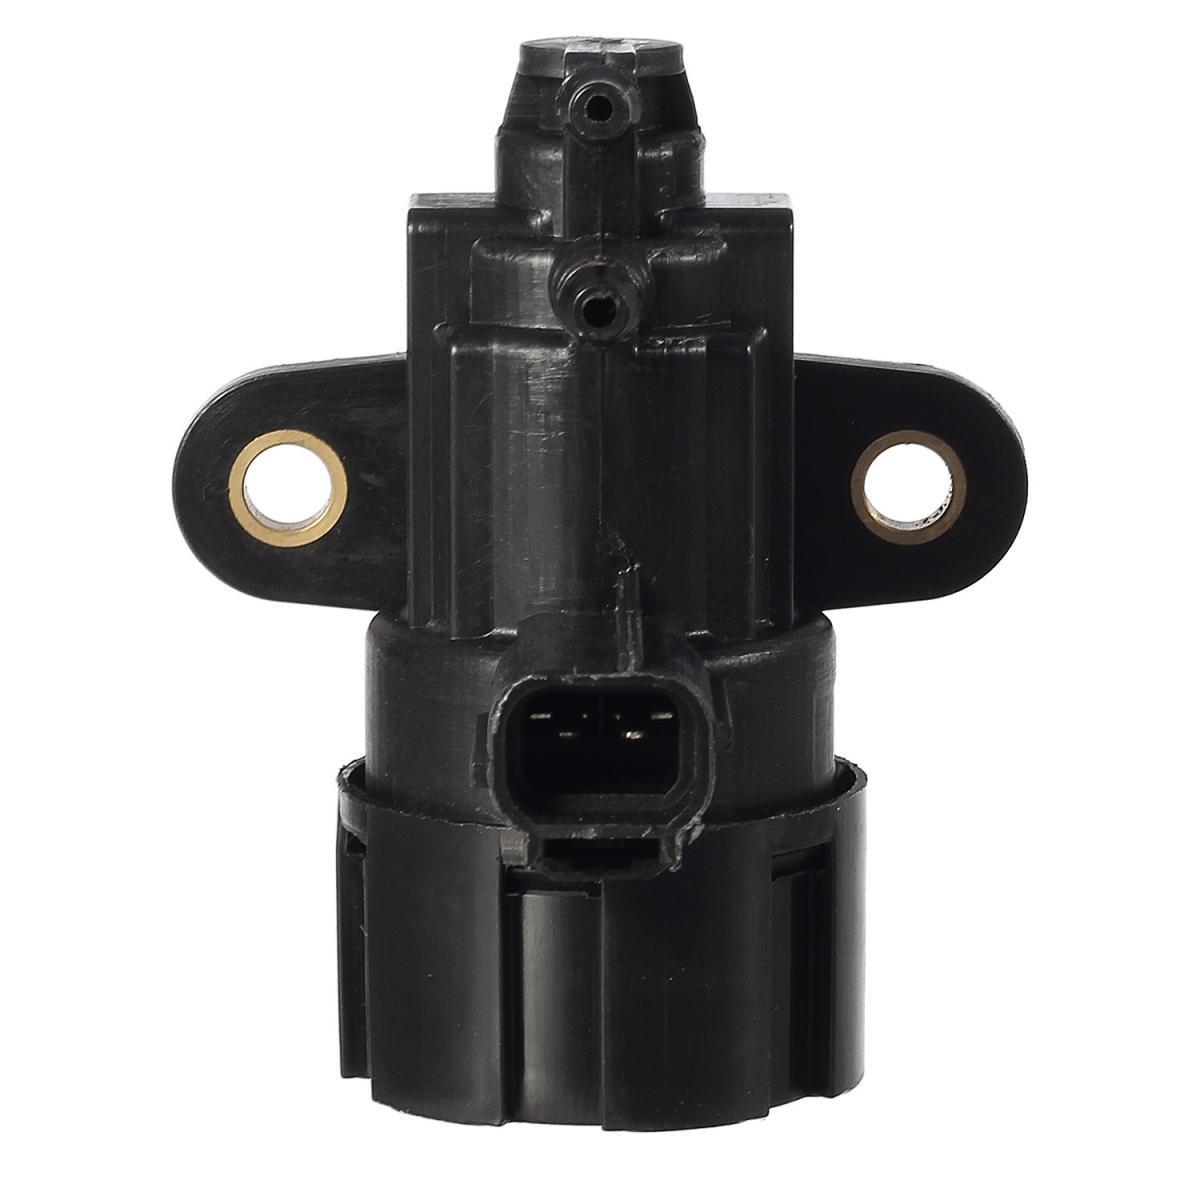 Vs63 Evs58 911128 Egr Vacuum Solenoid Valve F57z9j459c For